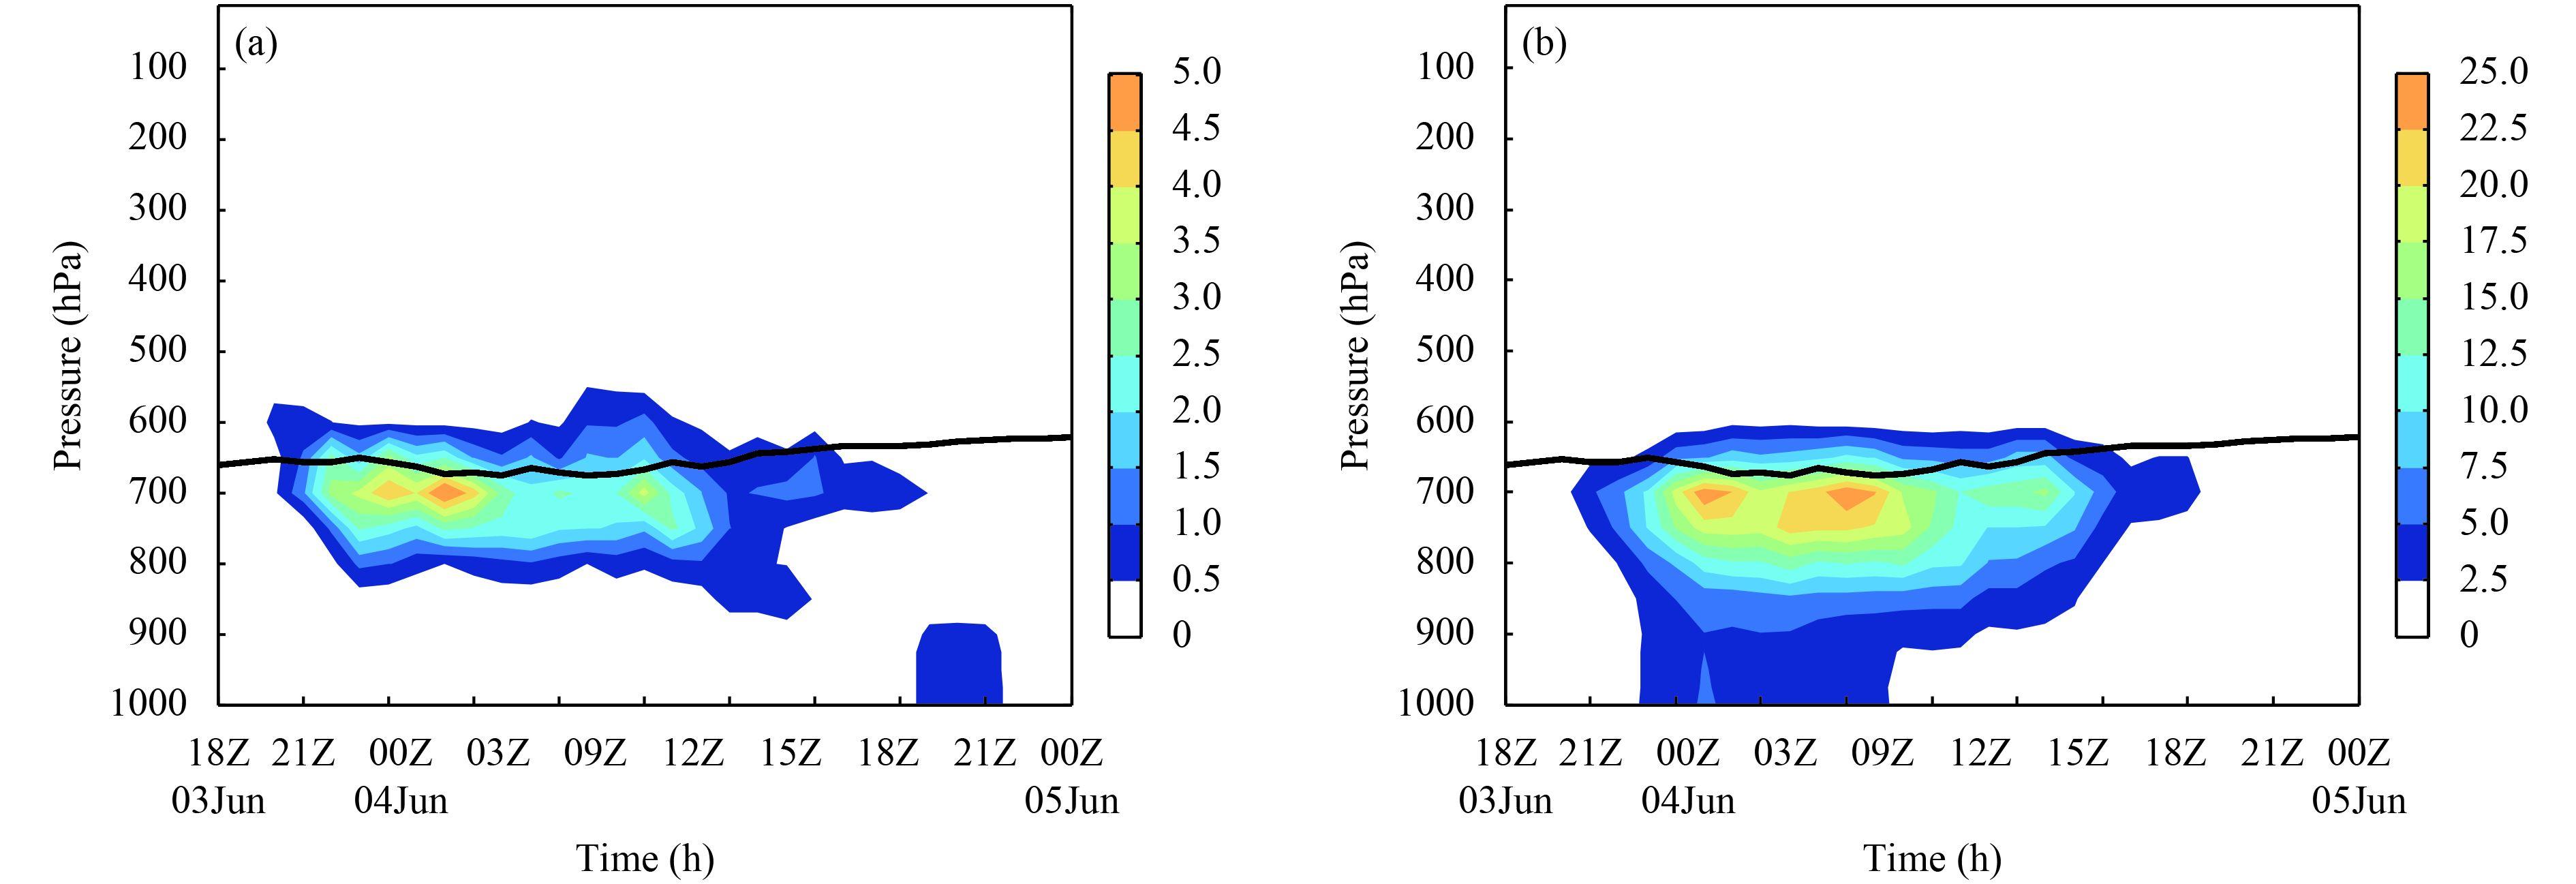 Applying the WRF Double-Moment Six-Class Microphysics Scheme